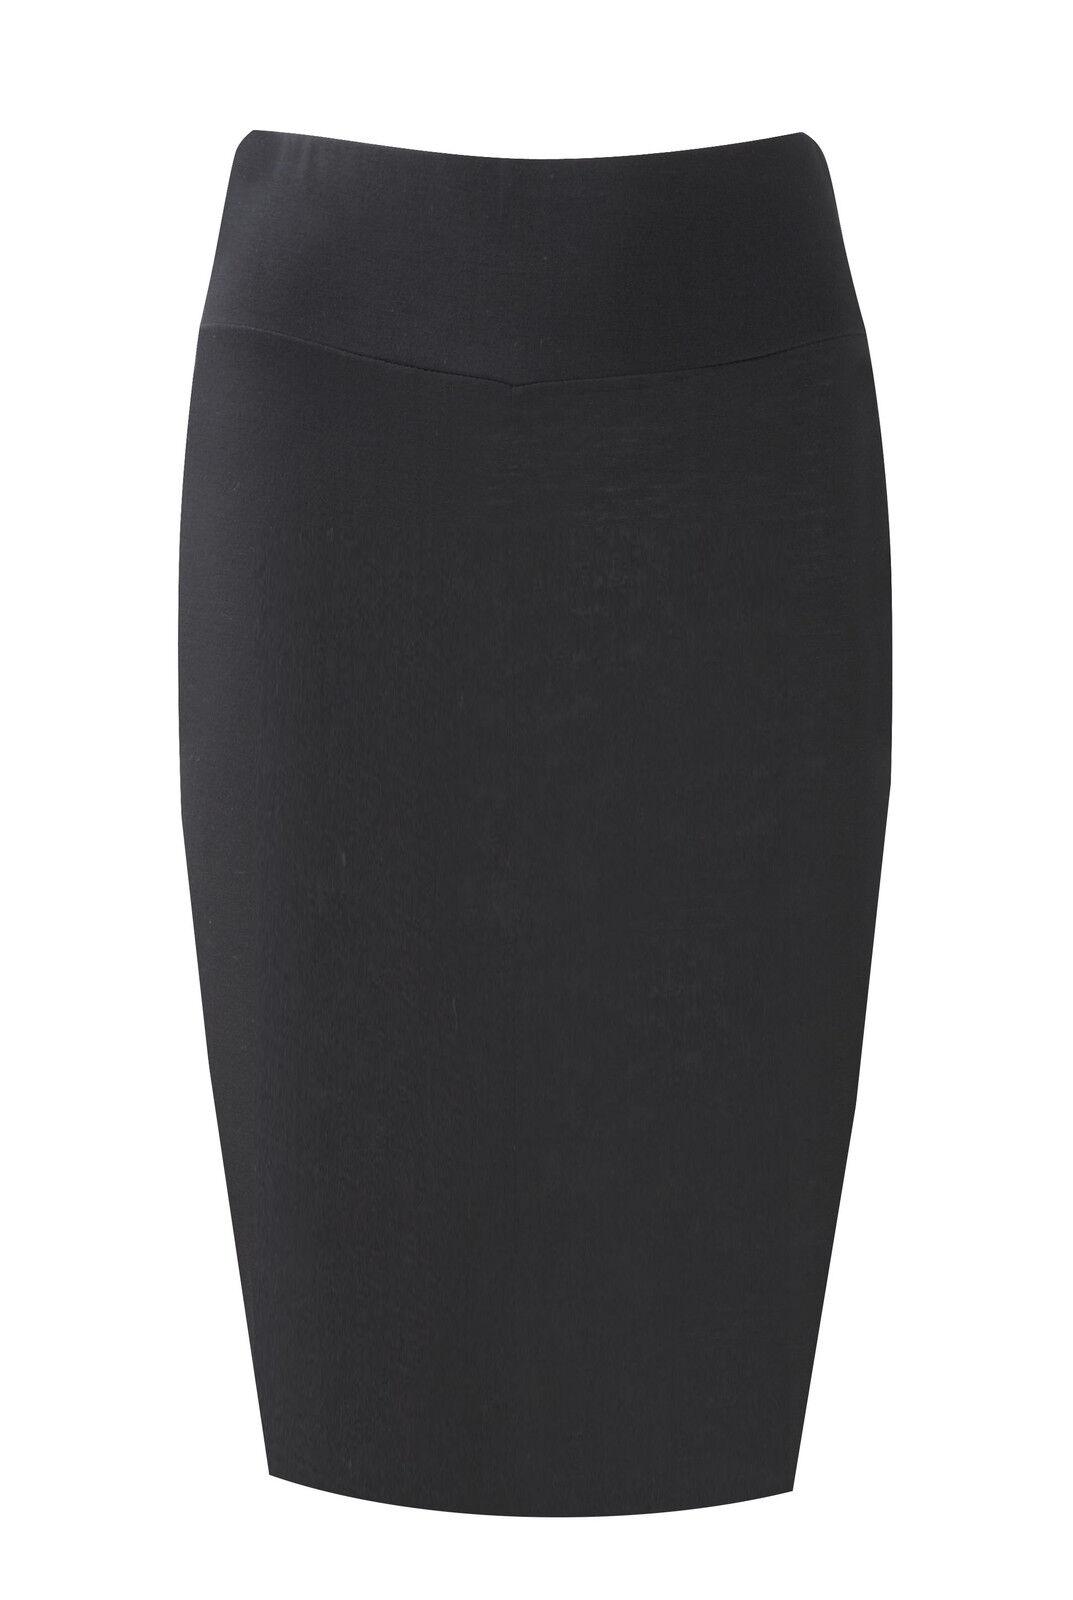 Ladies Skirts Size 16